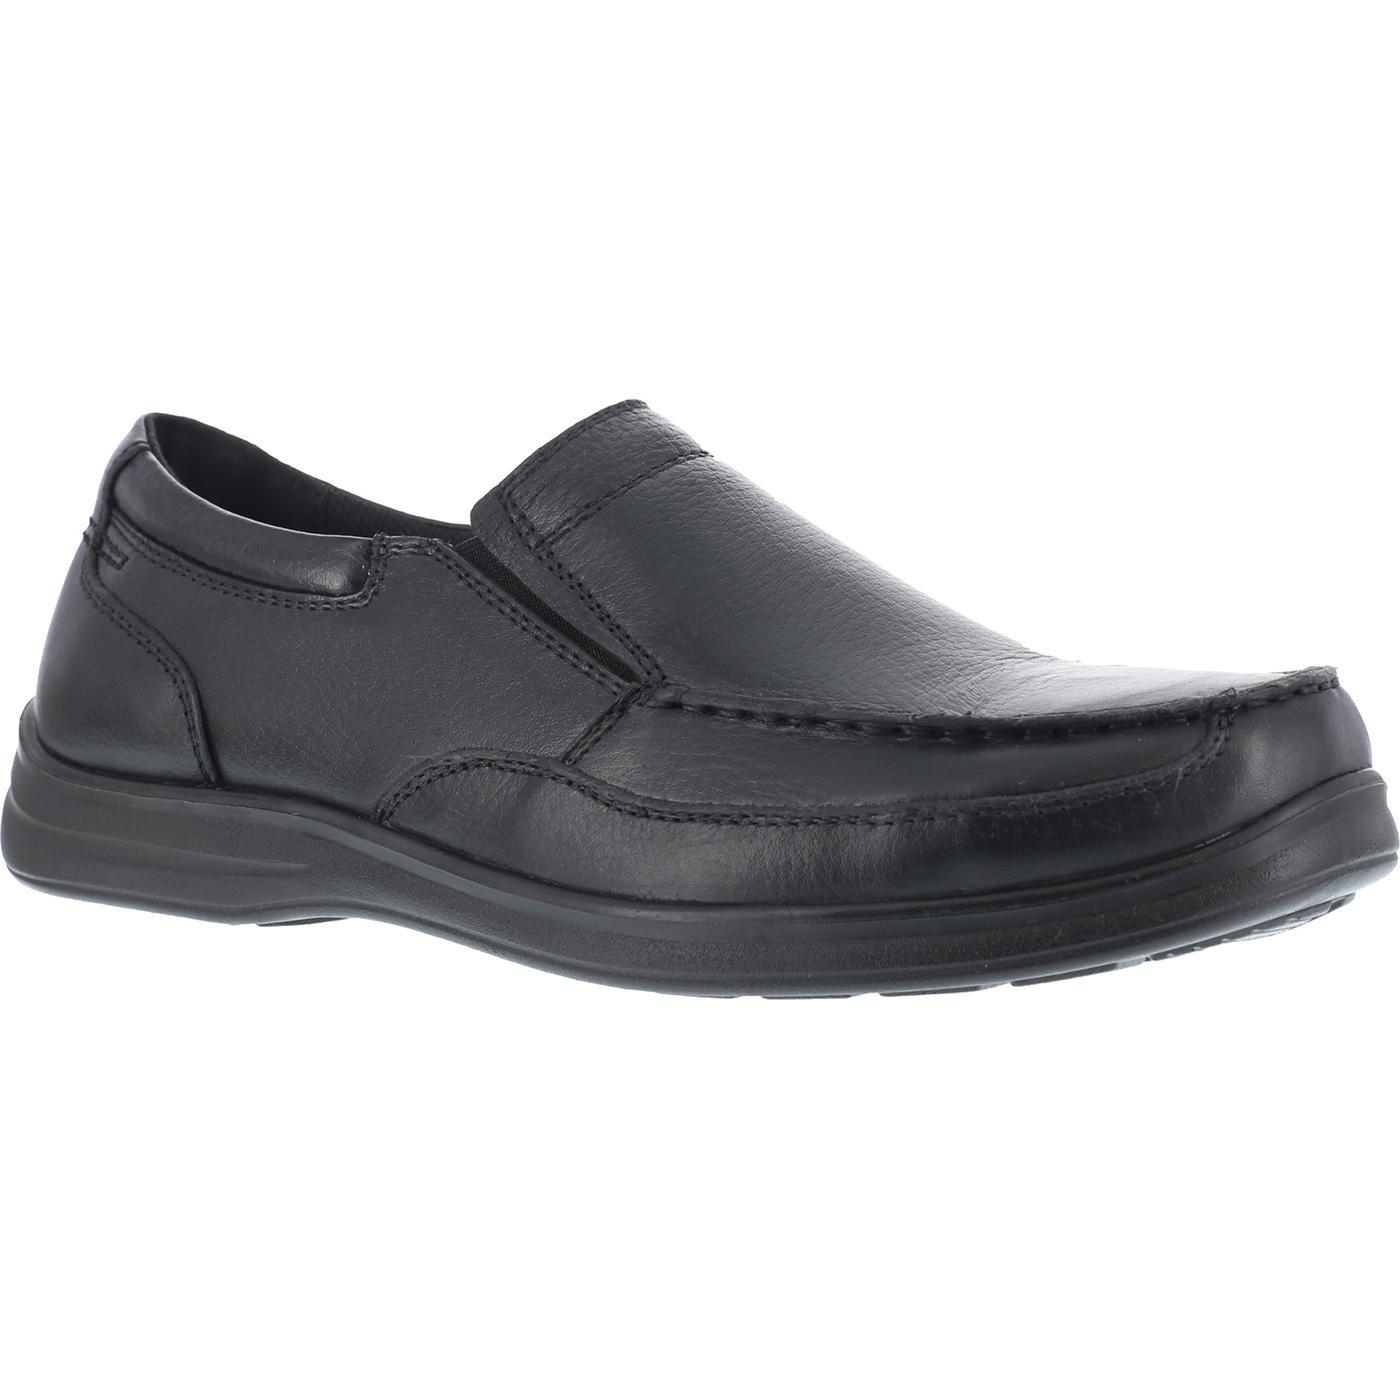 bf49822c70a Florsheim Work Wily Women's Steel Toe Static-Dissipative Work Moc Toe Slip  On Shoe